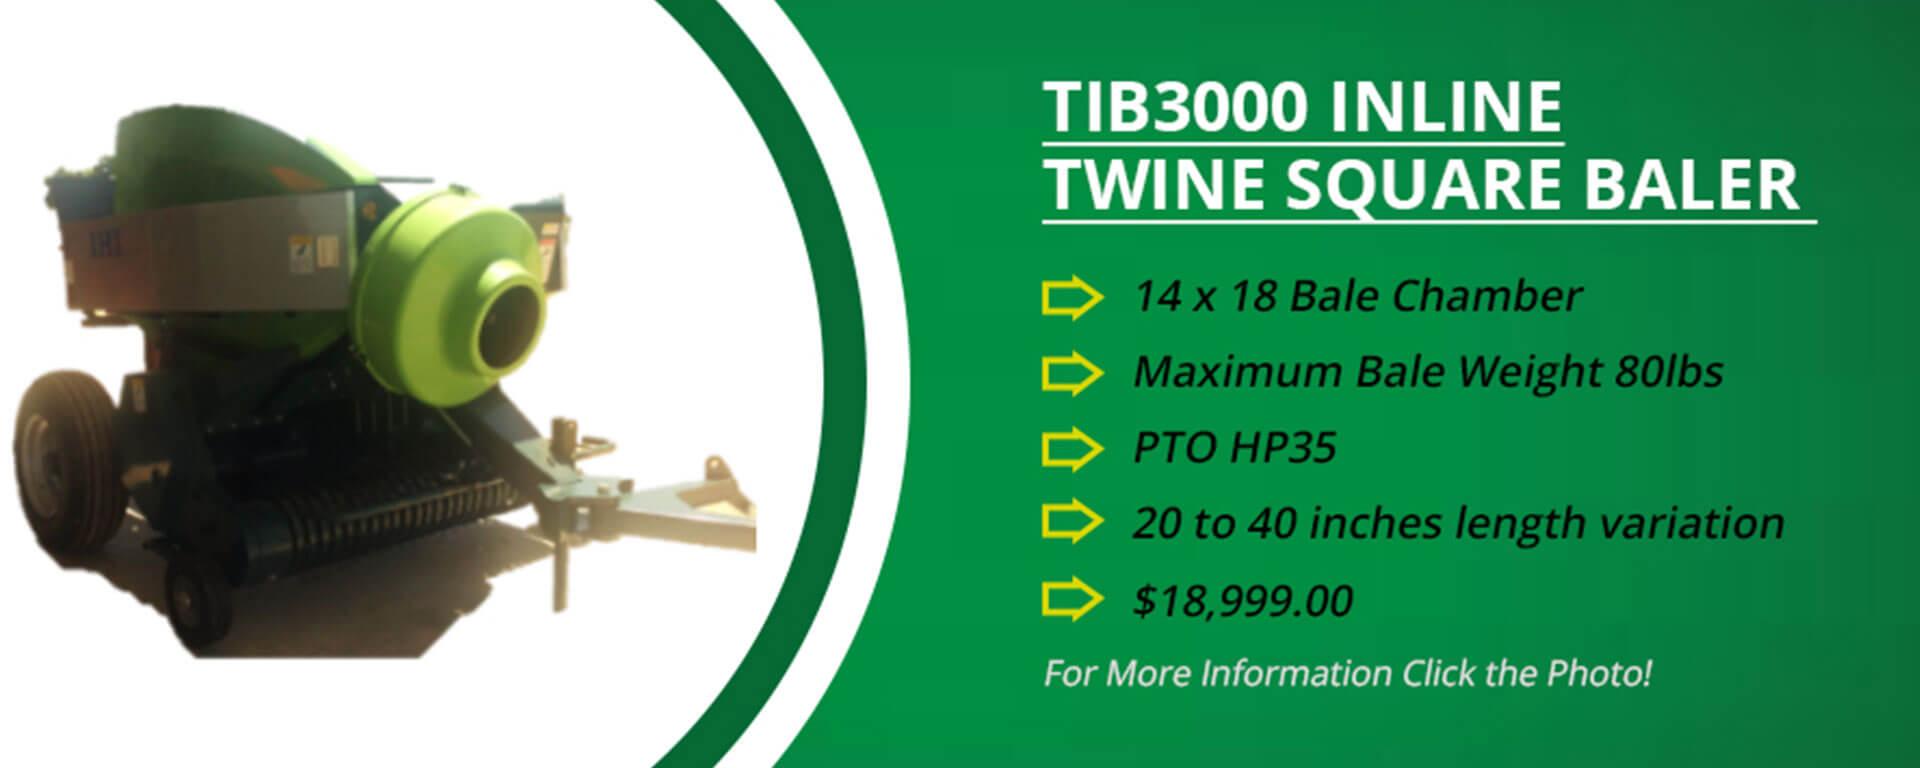 TIB3000 inline twin square baler banner 5